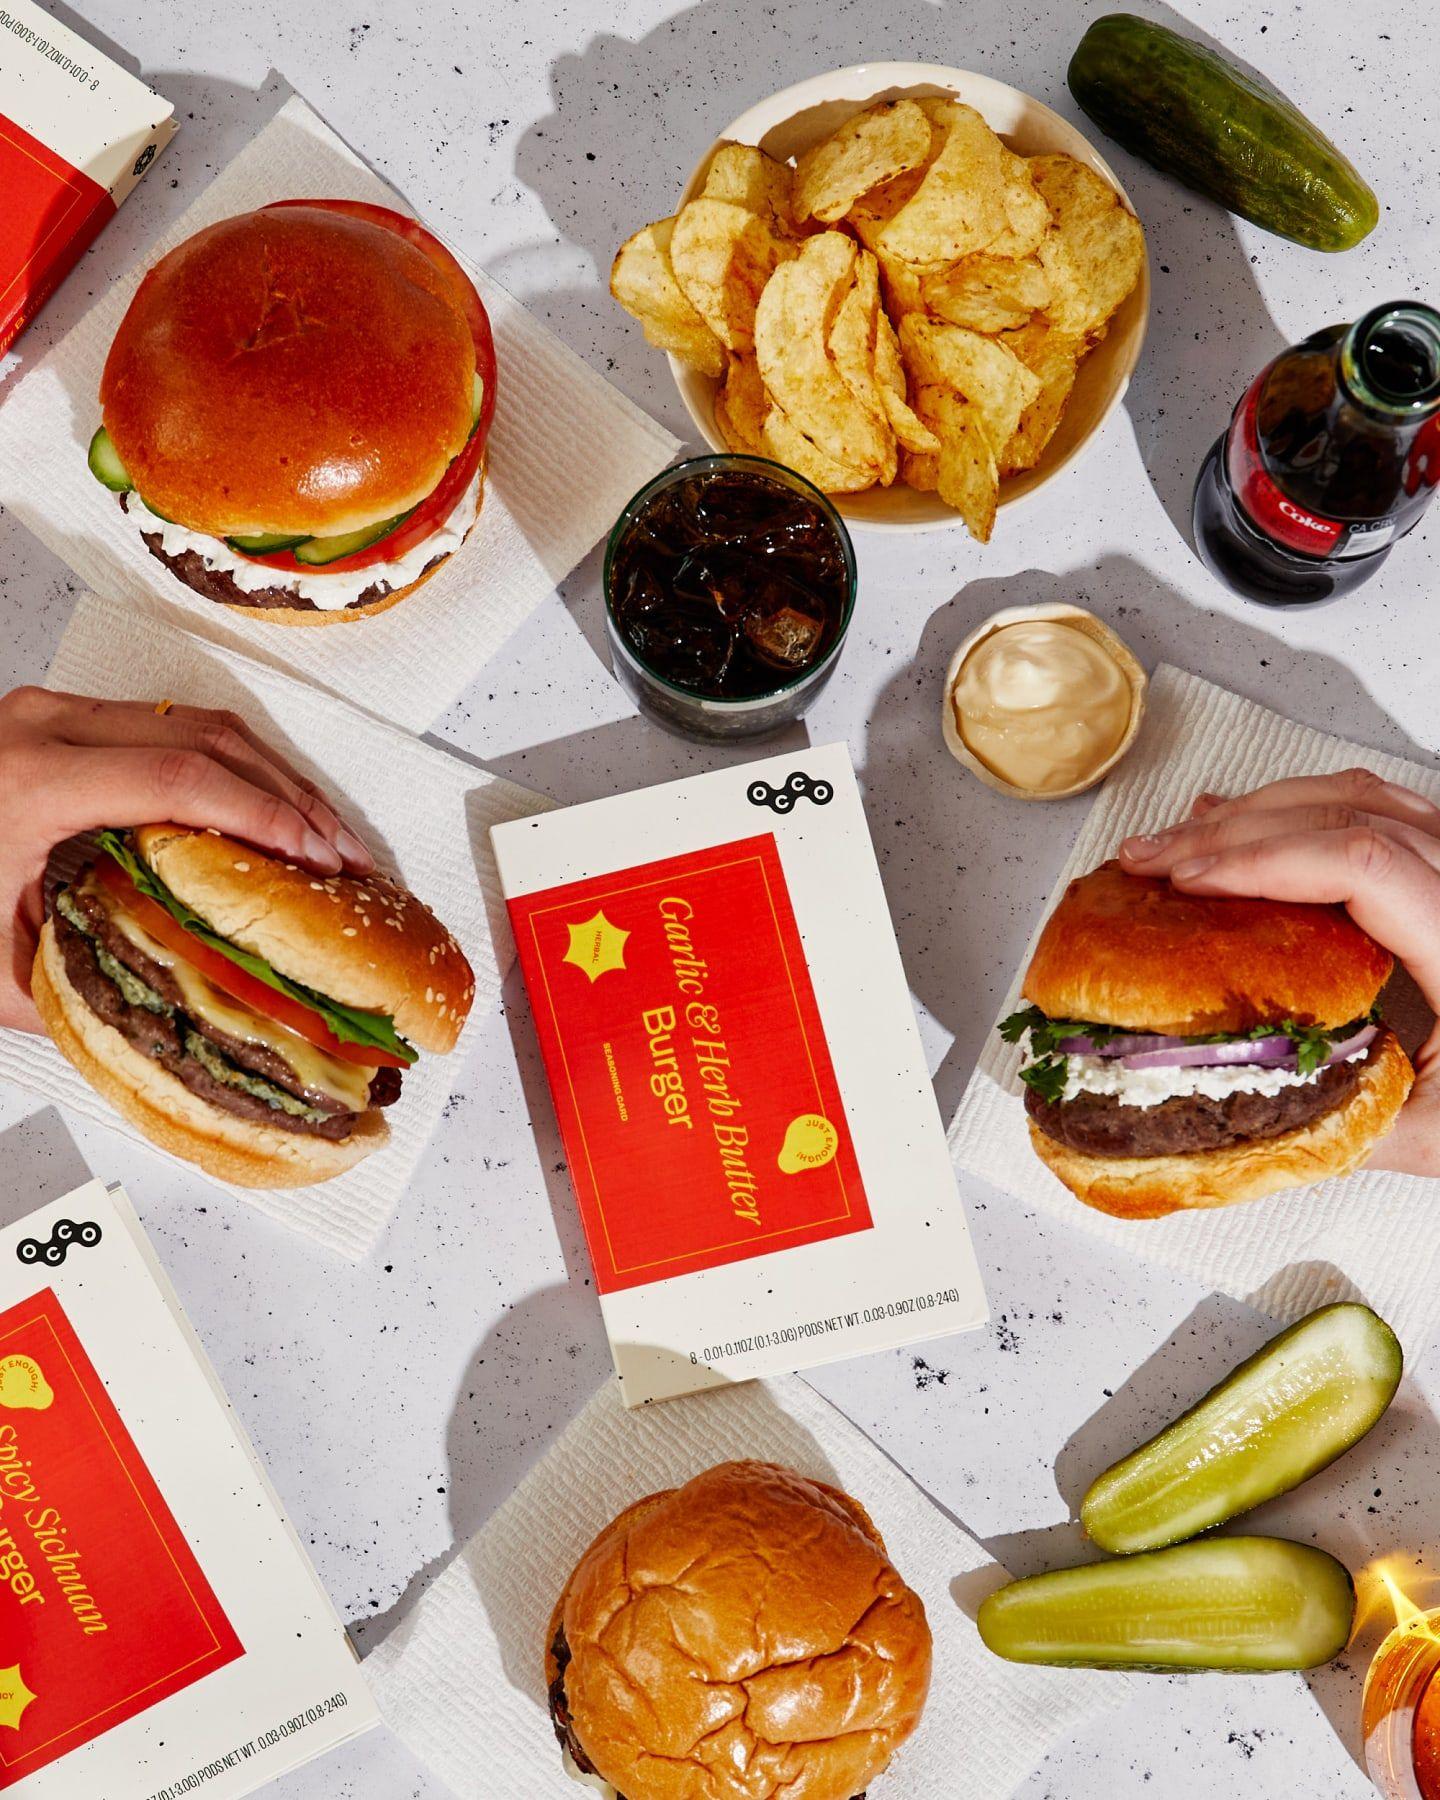 The Burger Sampler